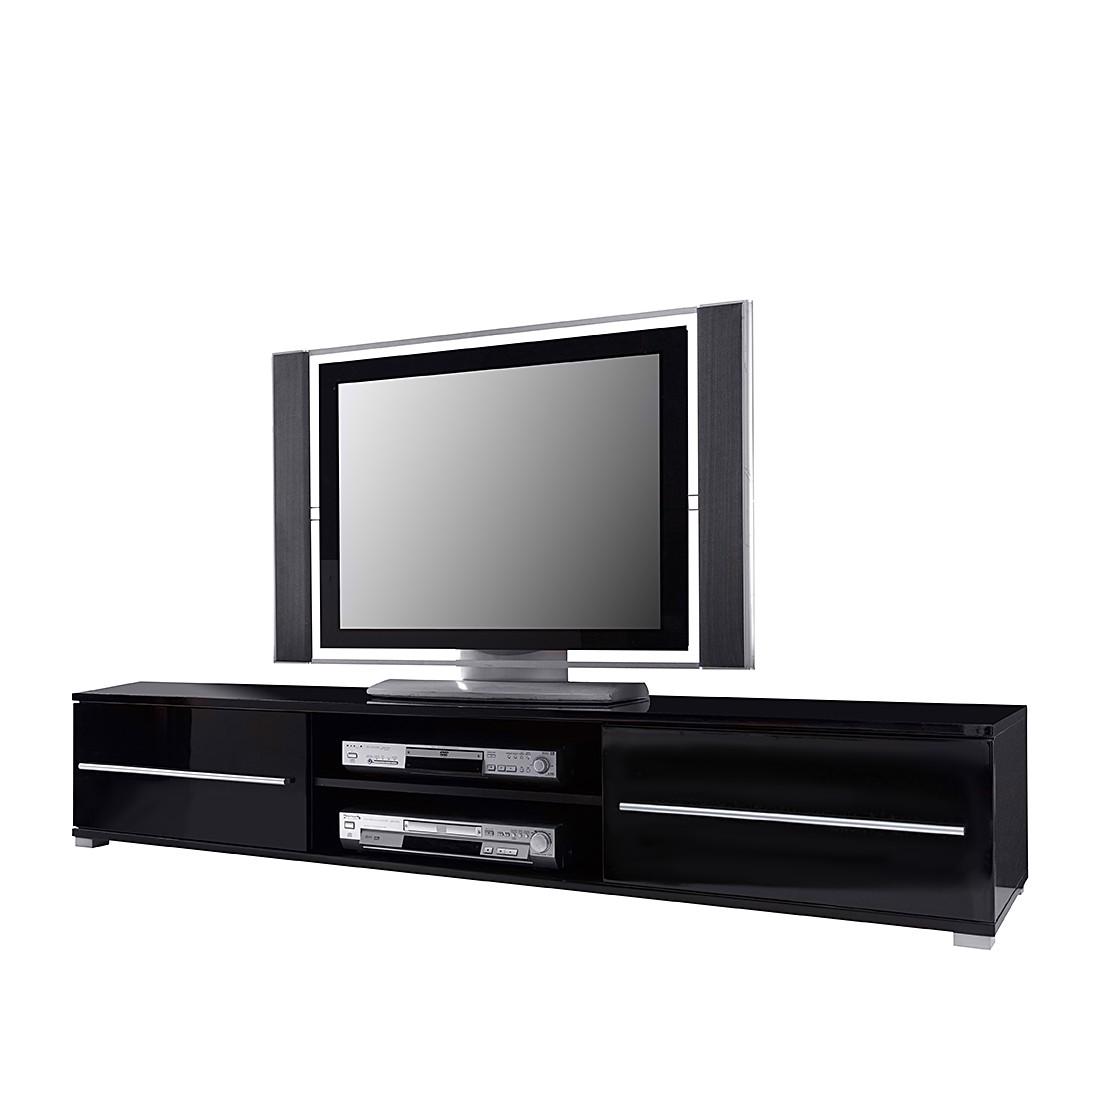 TV Lowboard Mert - Schwarz